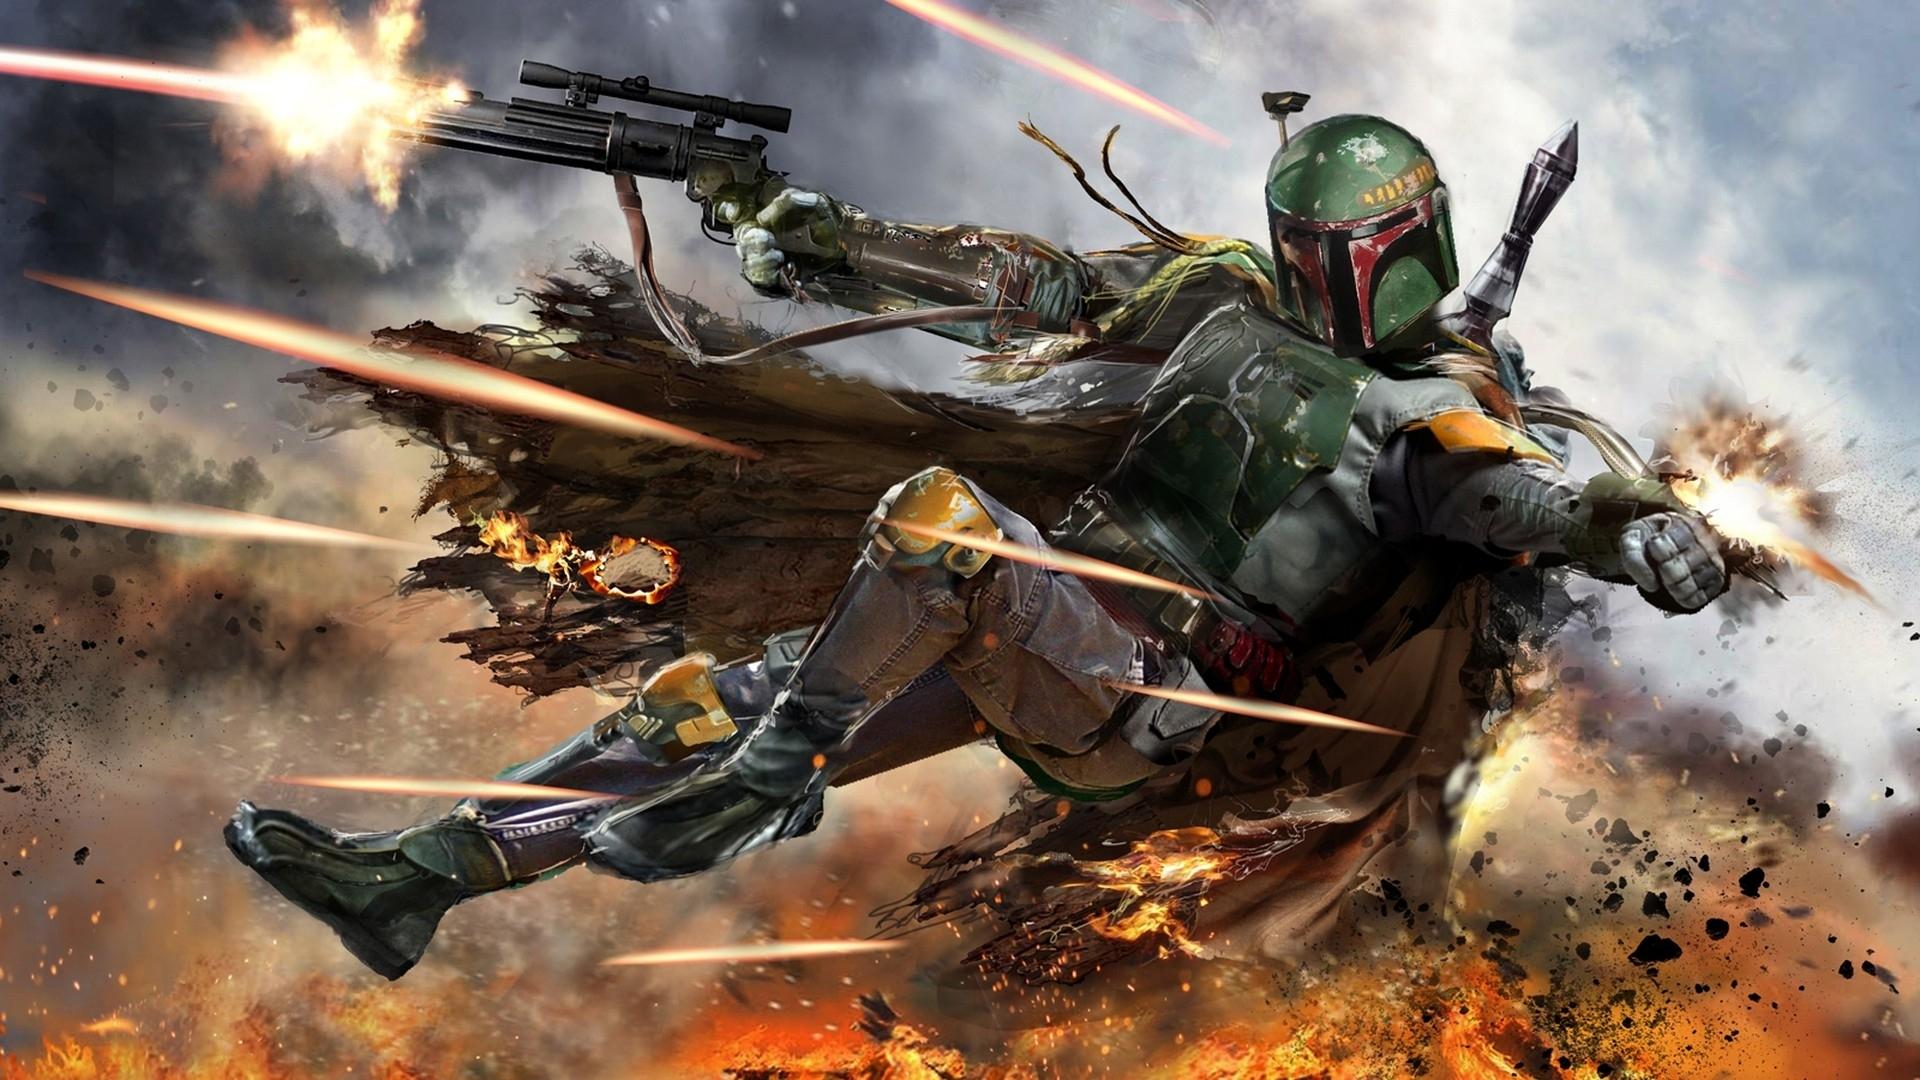 wallpaper : star wars, battle, boba fett, bounty hunter